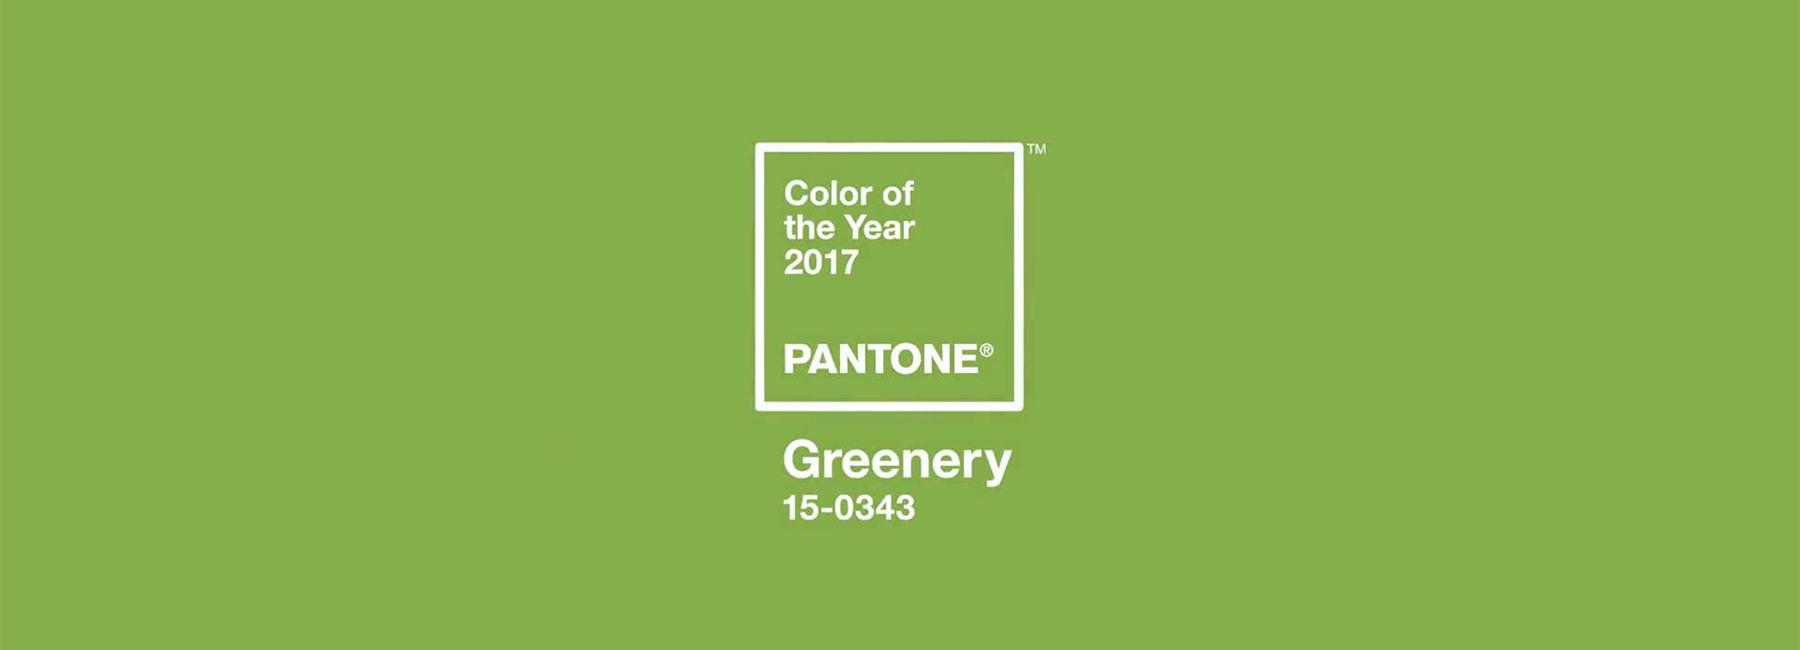 Bridalbliss.com | Pantone Color of the Year | Oregon Washington Event Planning